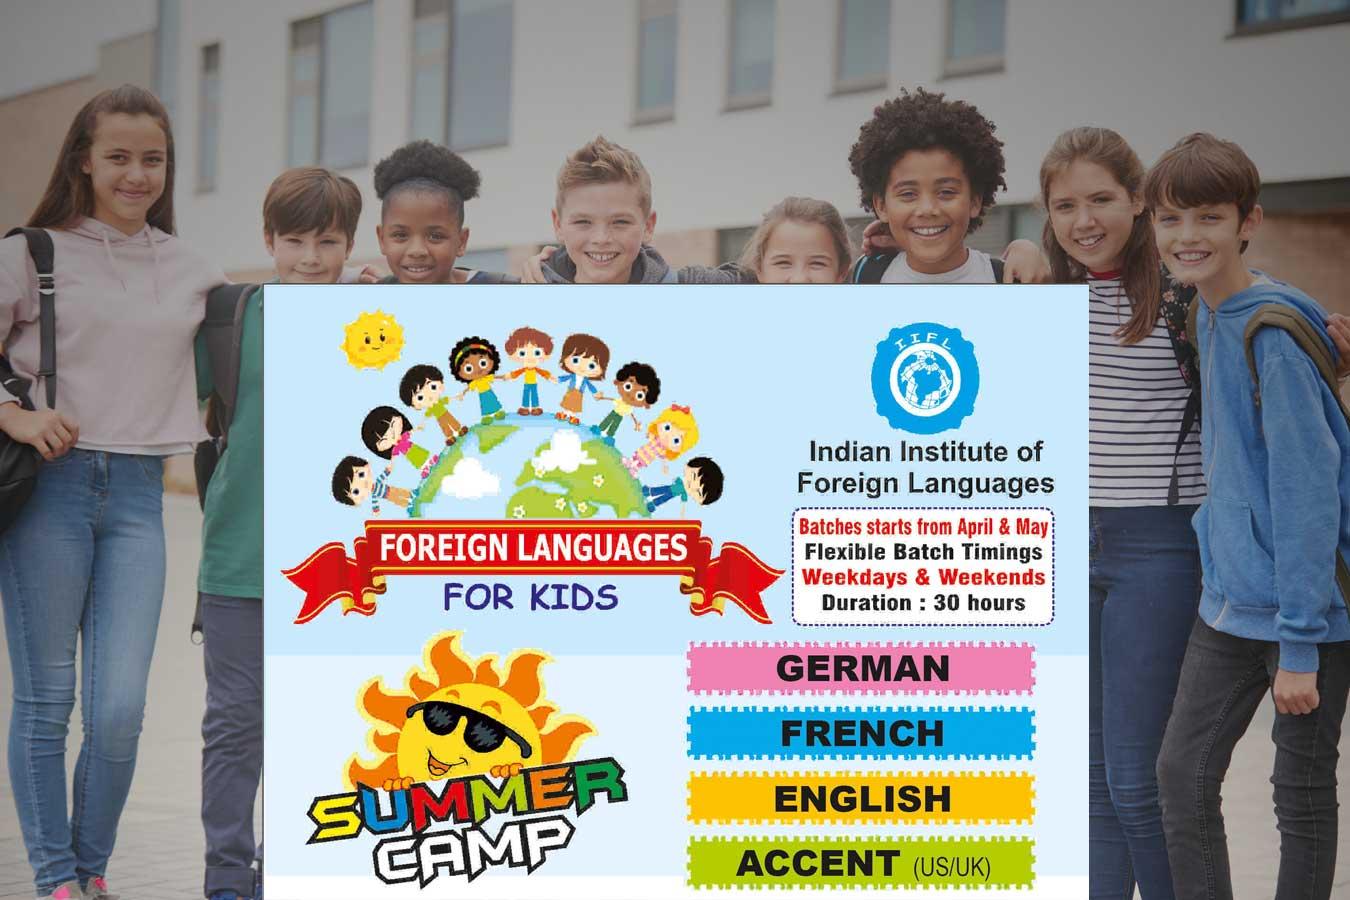 summer camp 2020 bangalore